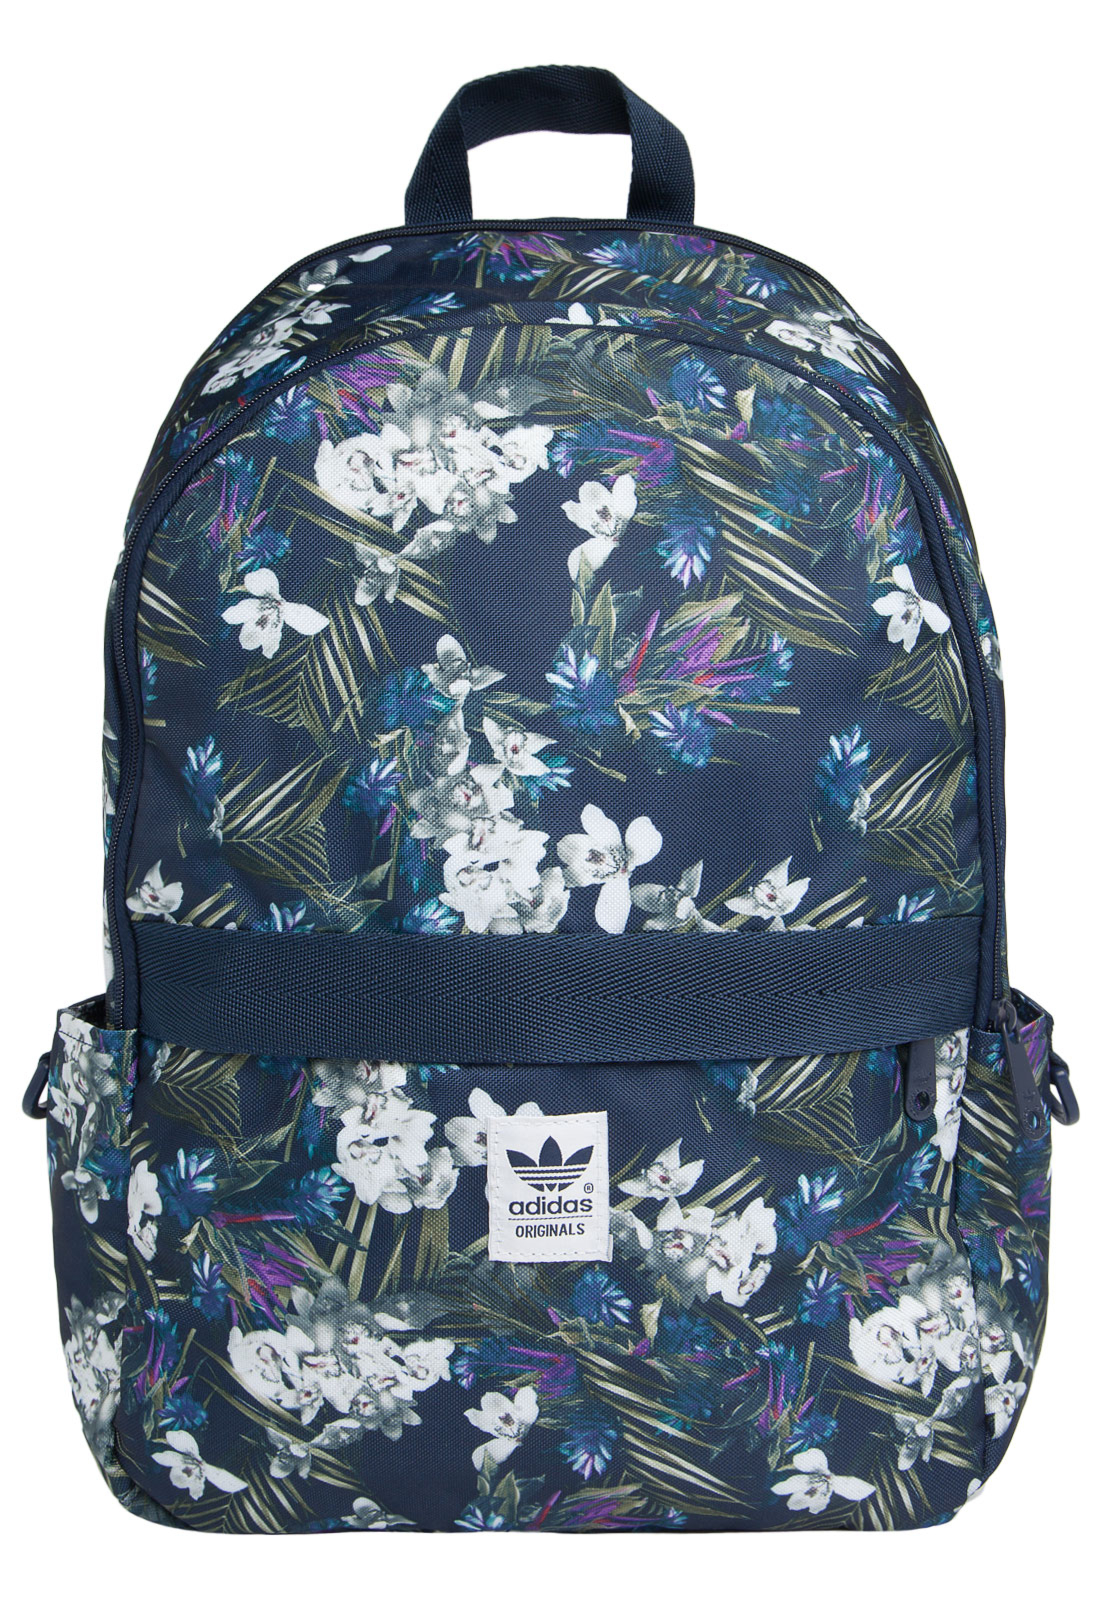 8985102fd Mochila Adidas Originals Dark Floral Azul Masculina - Bolsas Outlet